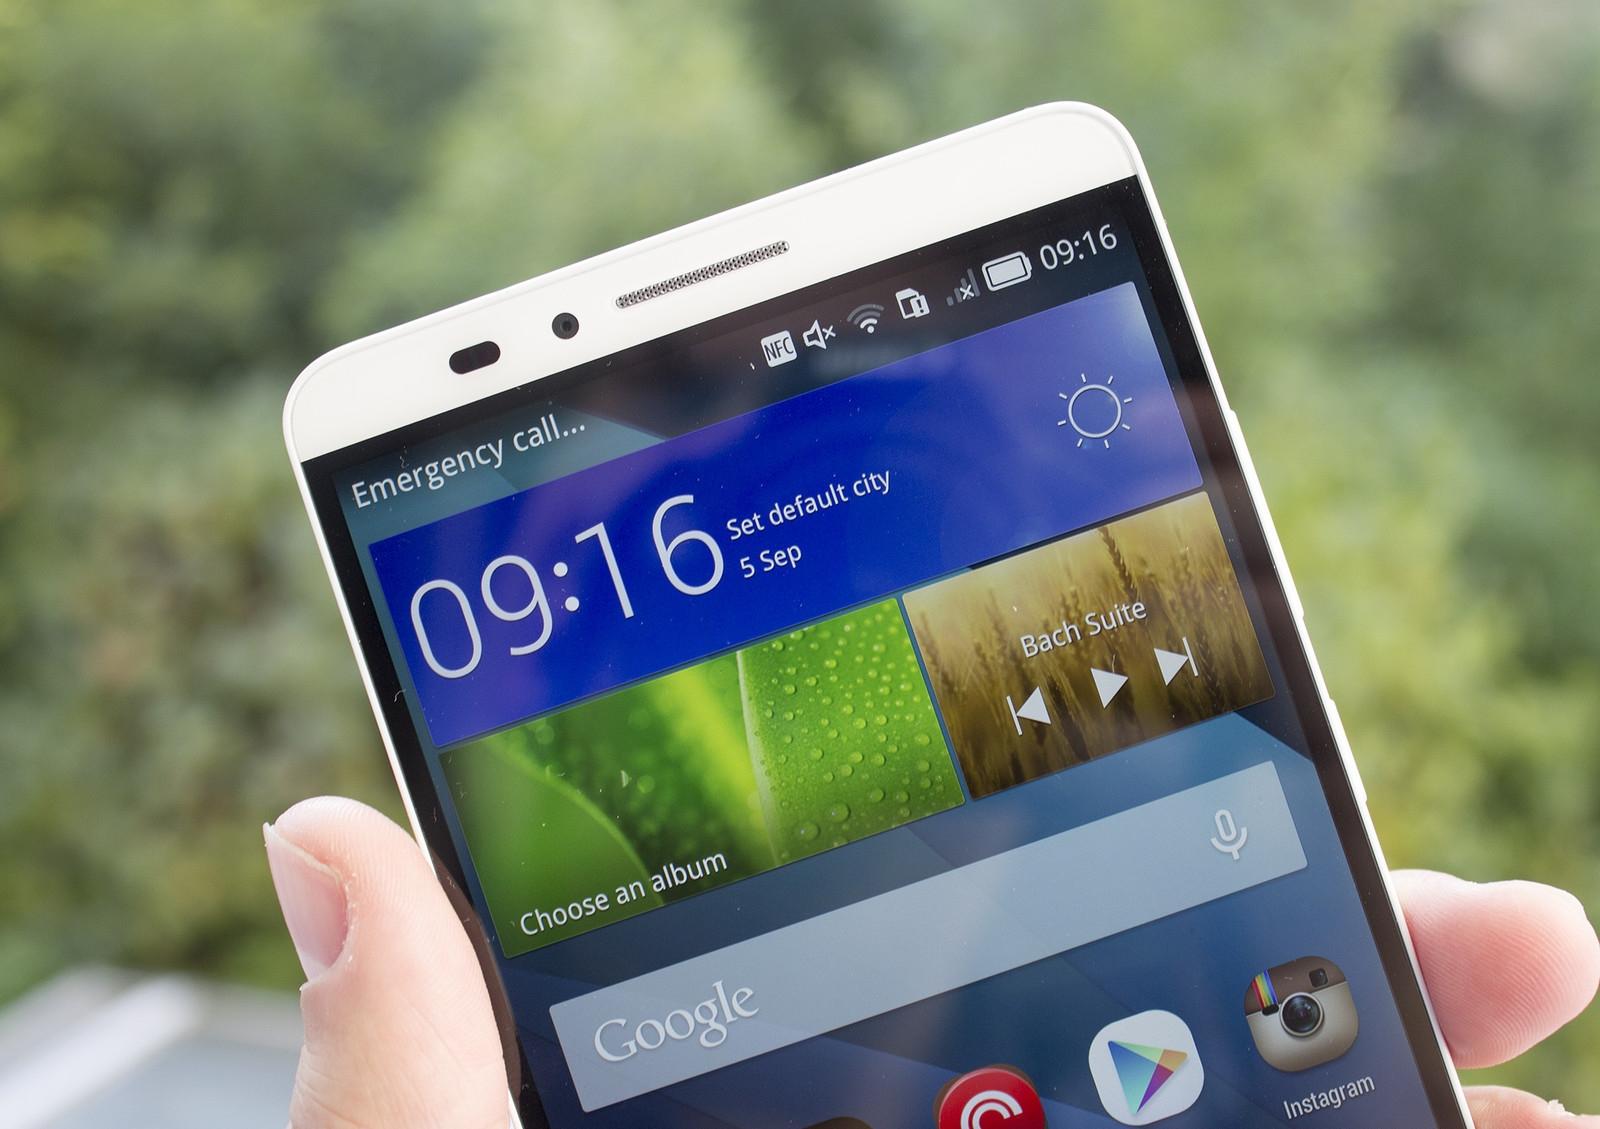 Huawei Ascend Mate7 Display